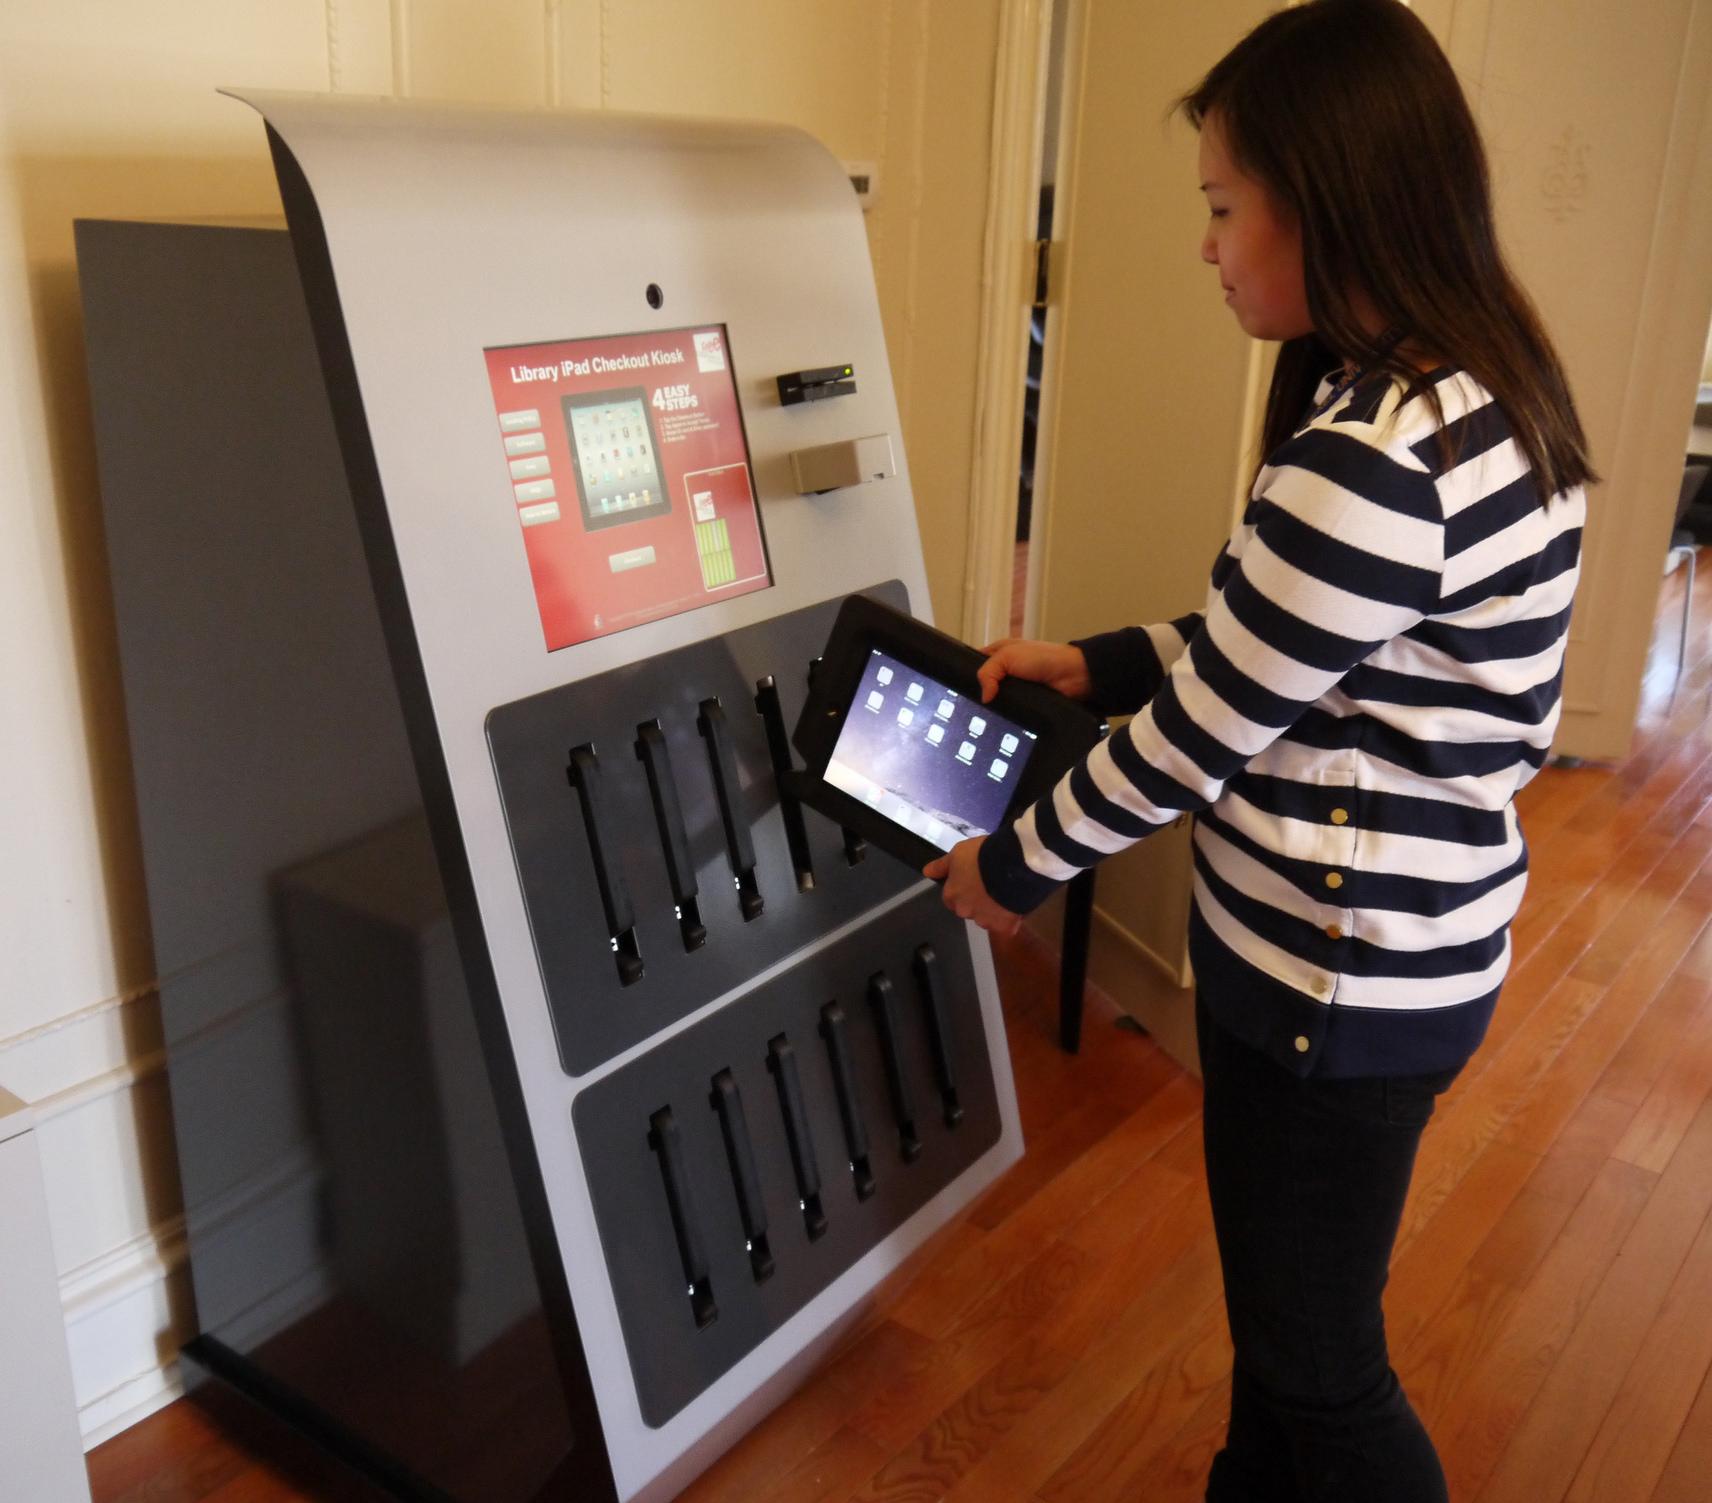 Ipad kiosk checking out ipad